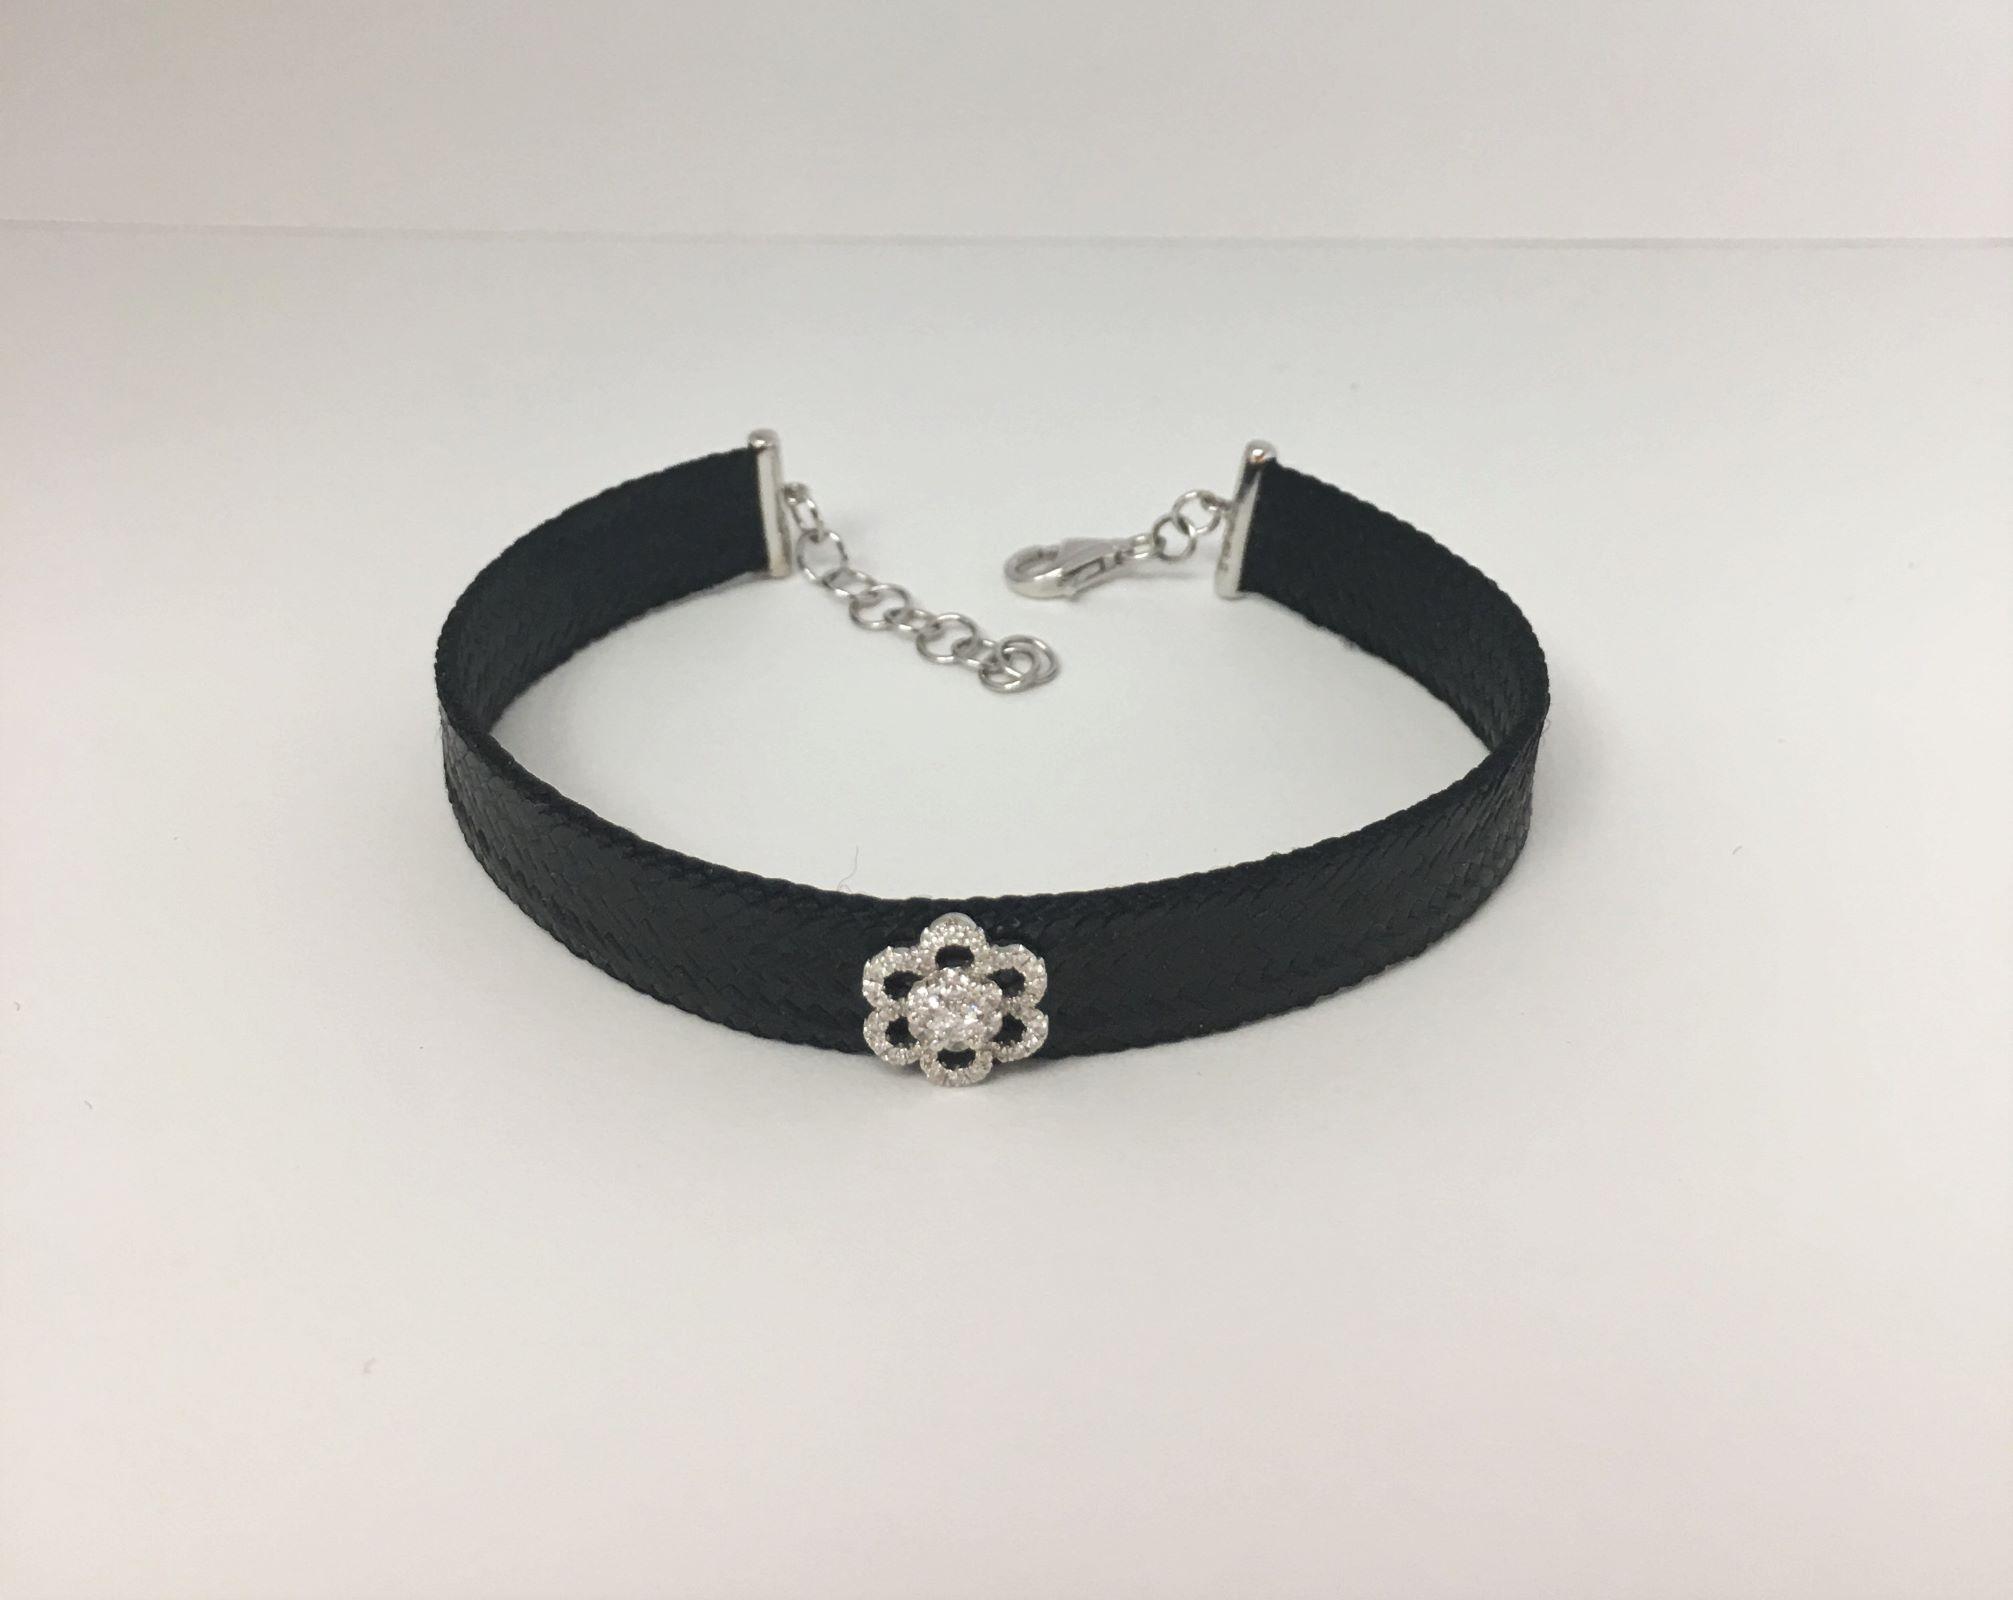 Black Color Fabric Bracelet With Diamonds